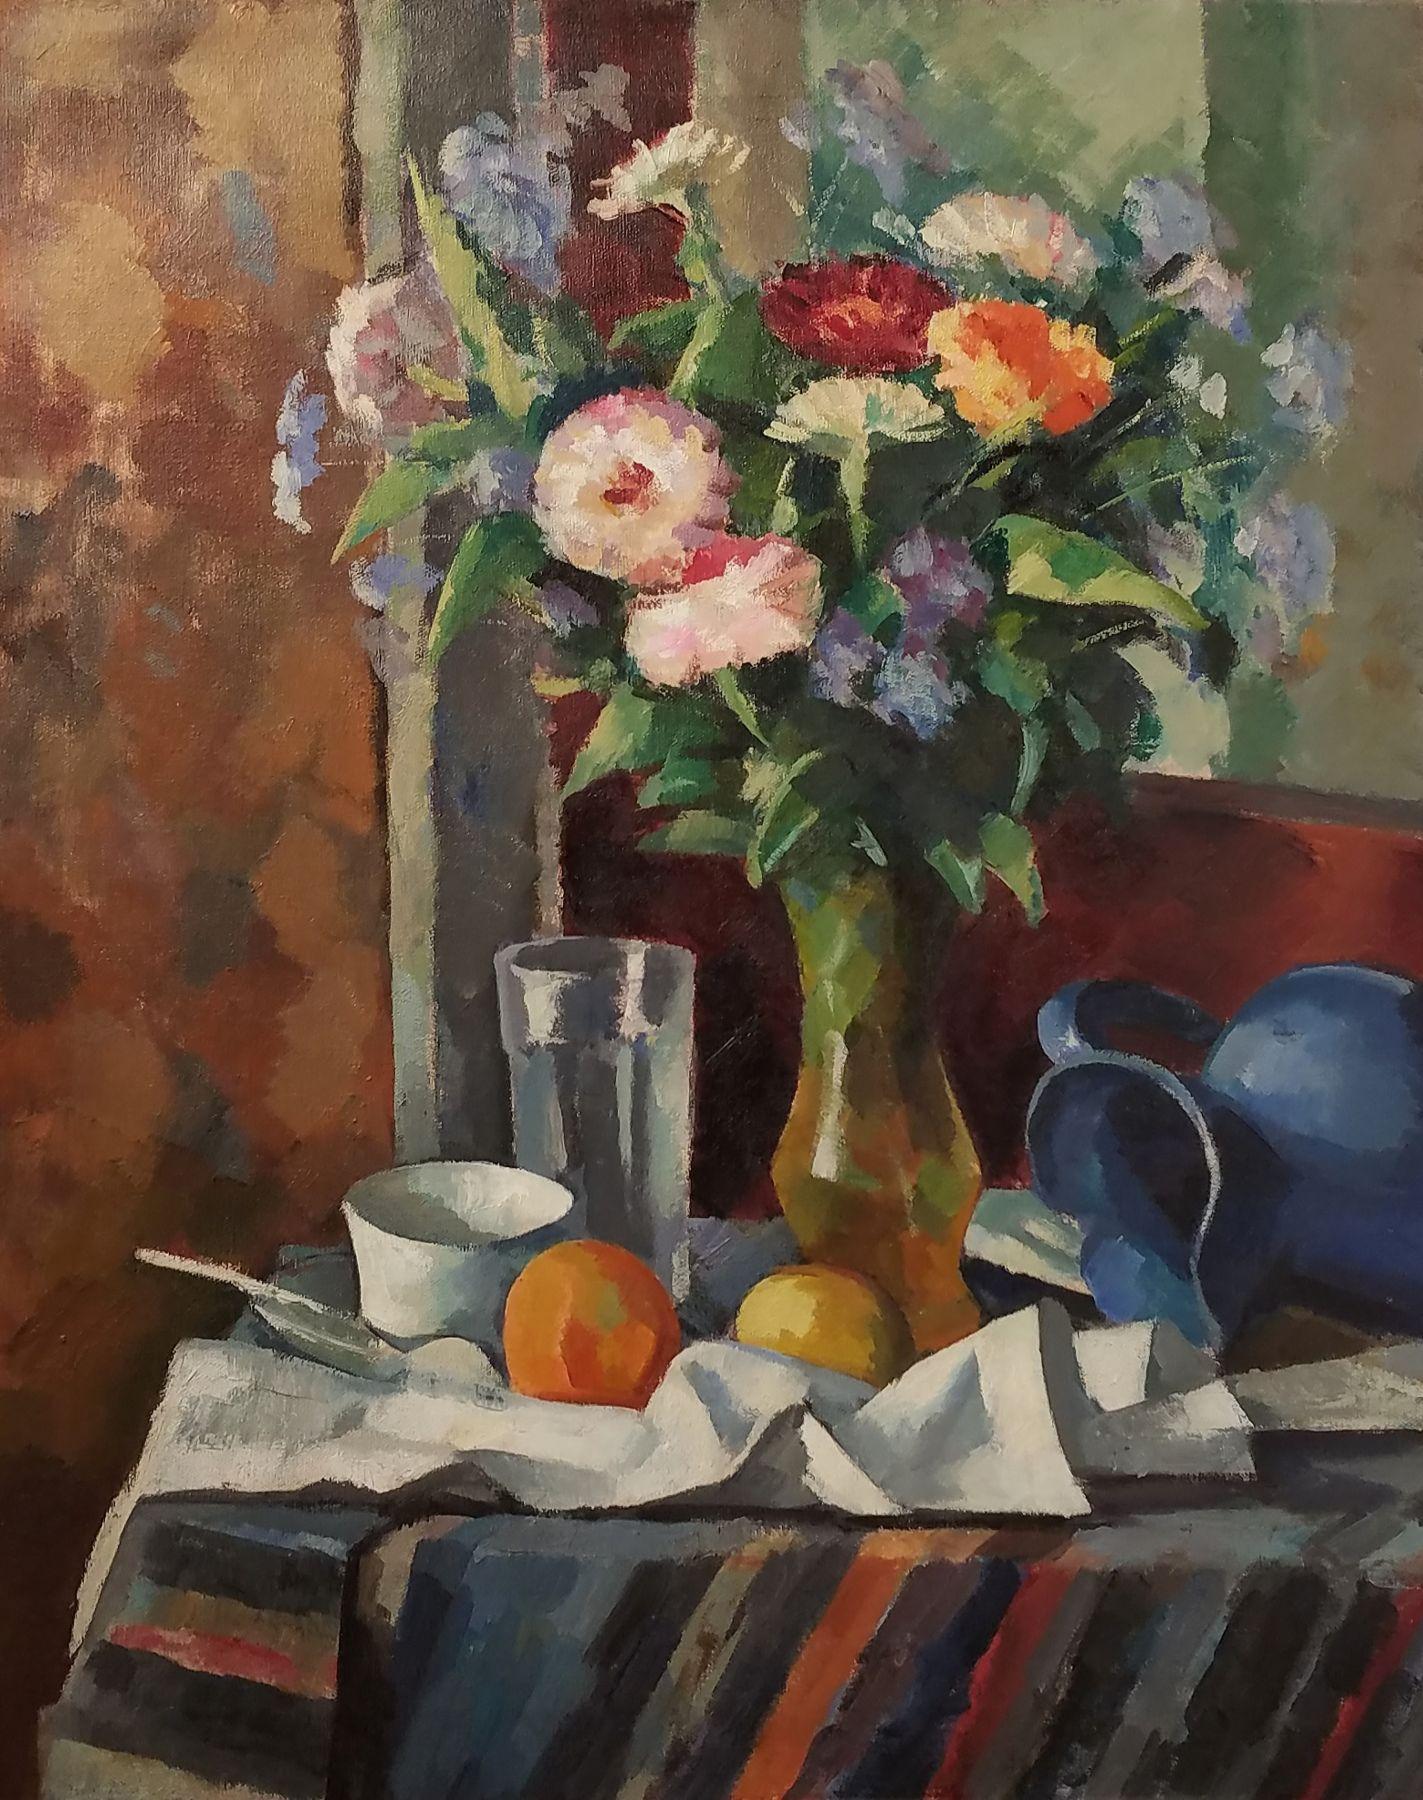 Edward Franklin Fisk, Still Life, ca.1932, oil on canvas, 30 1/8 x 24 1/4 inches